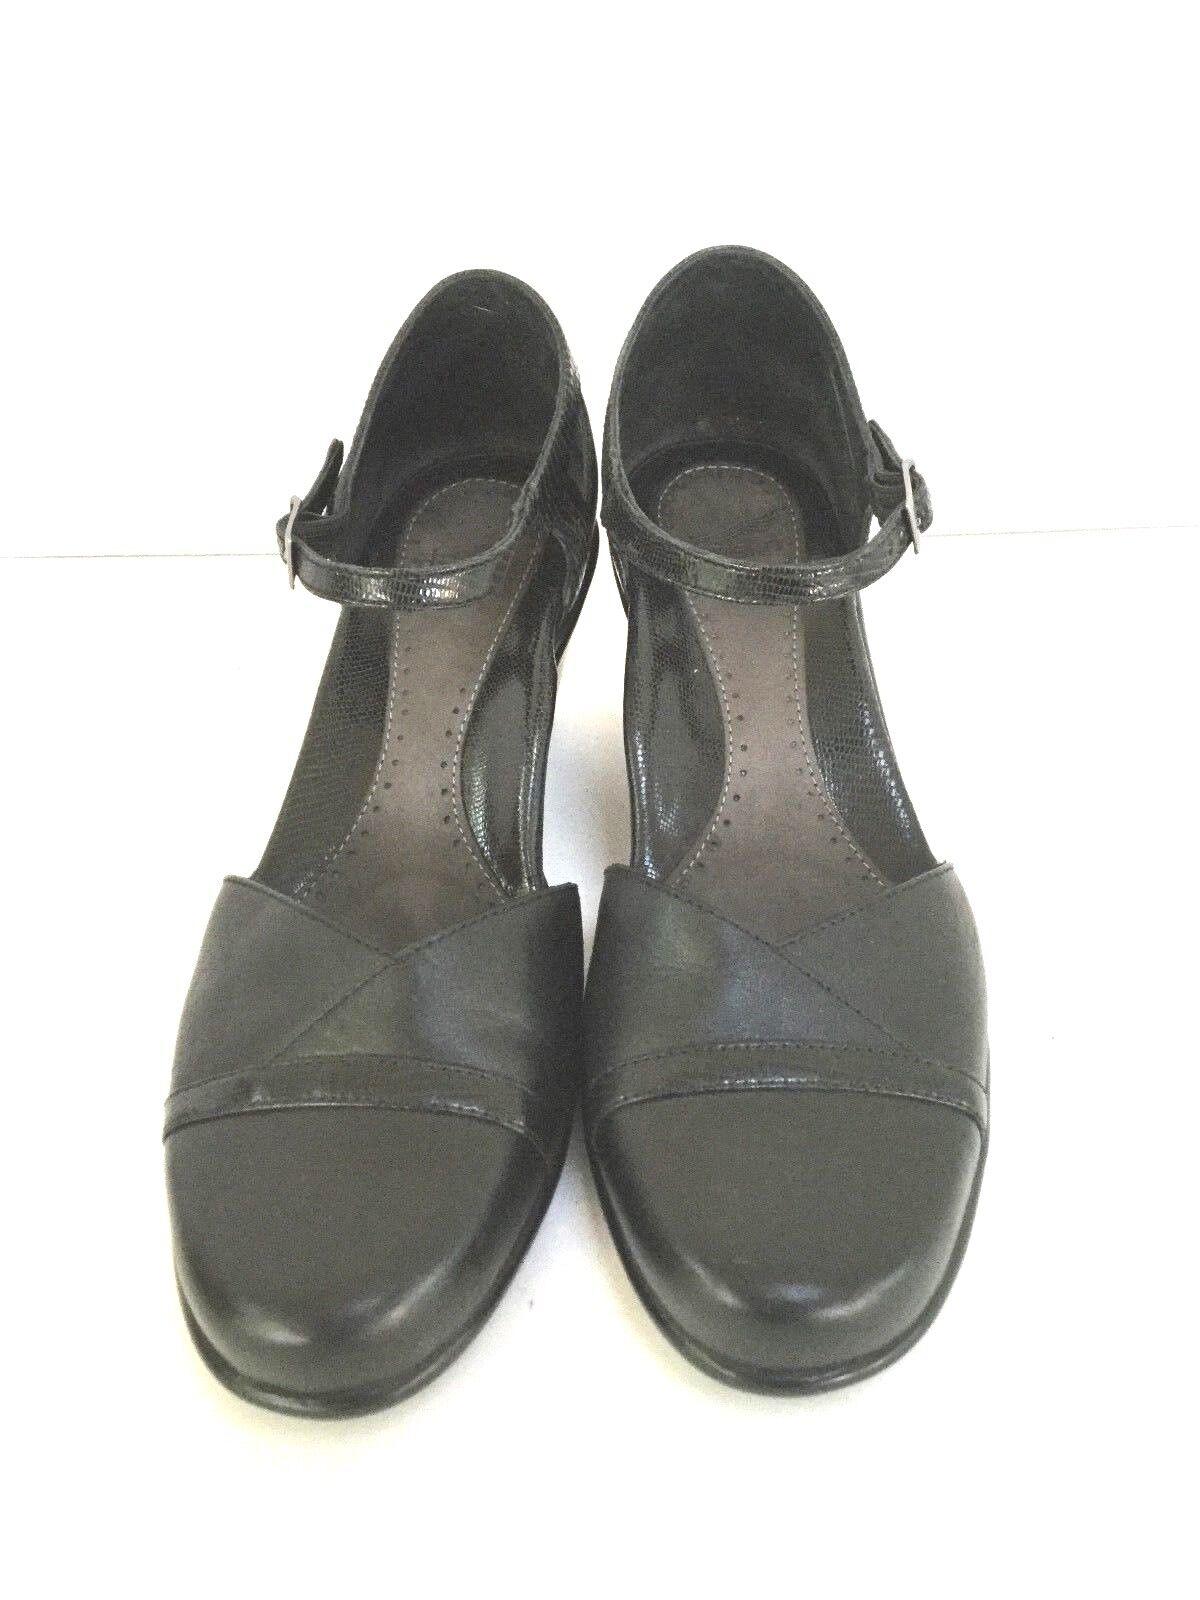 Dansko 38 Black Ankle Strap Mary Jane Shoes